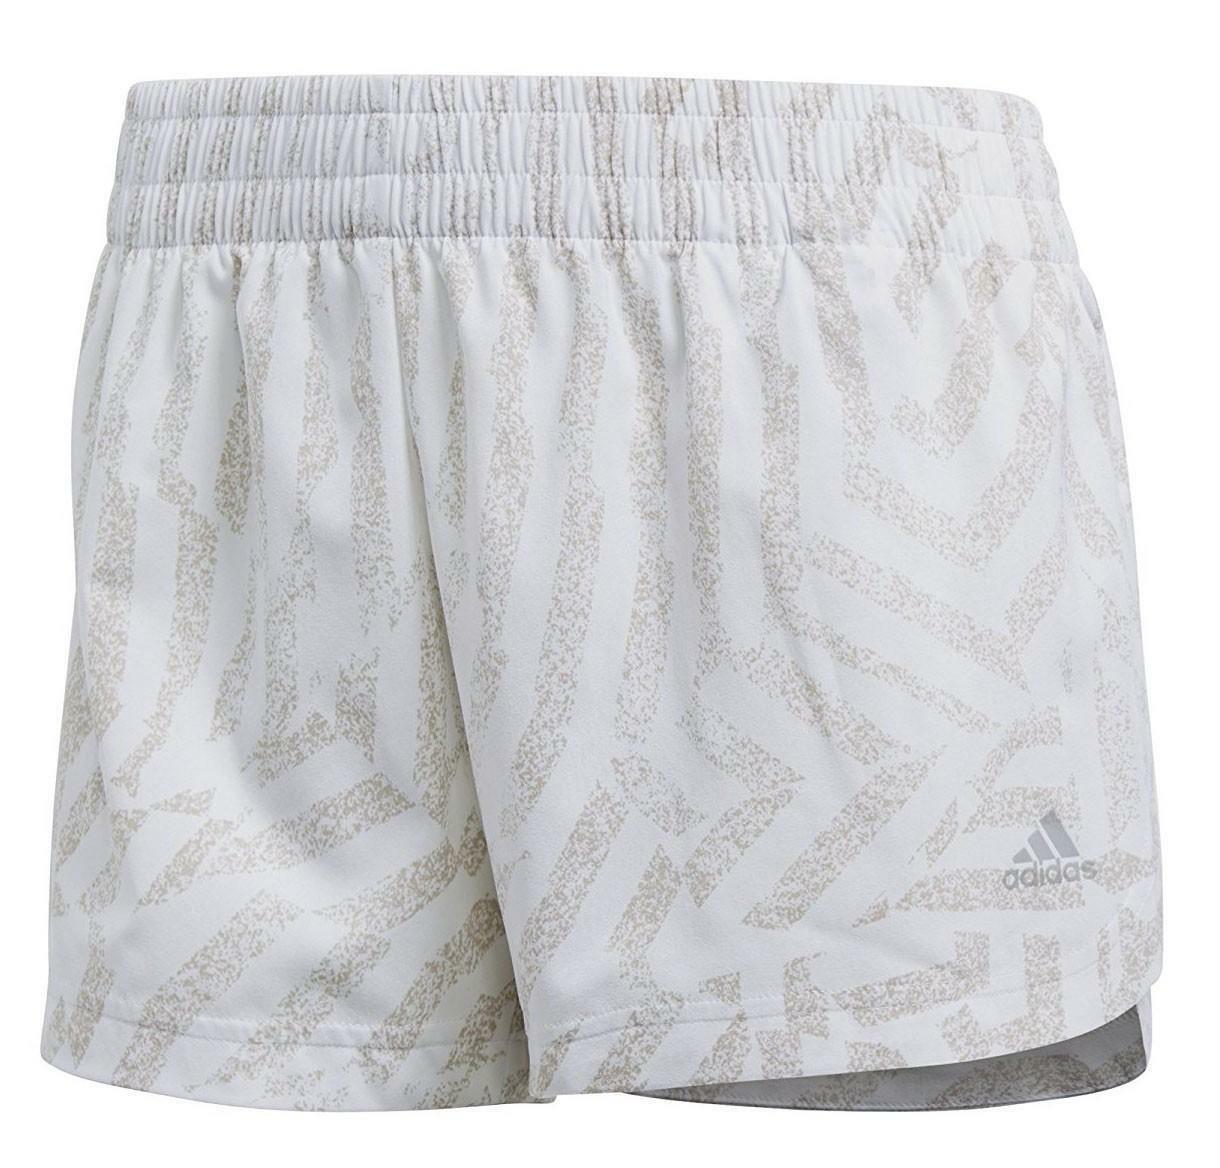 adidas adidas printed pantaloncini donna bianchi cd6415